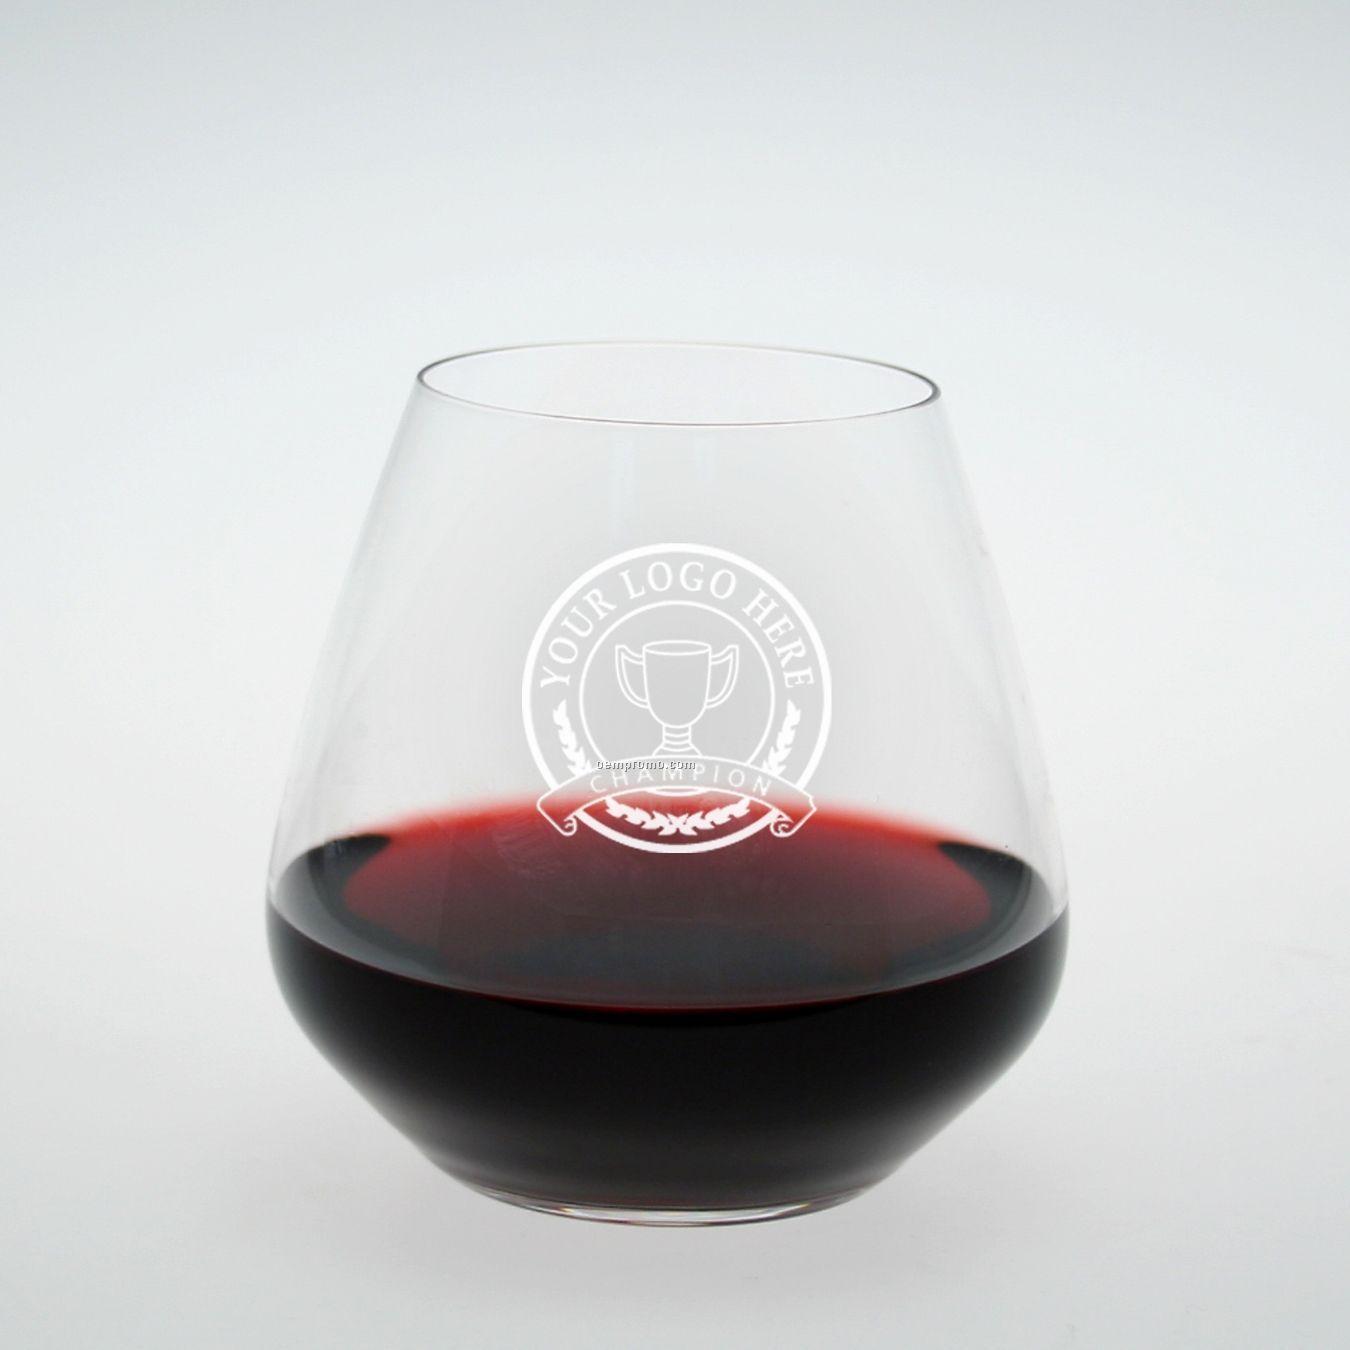 Studio Stemless Burgundy/ Pinot Noir Glass (Set Of 2 - Light Etch)